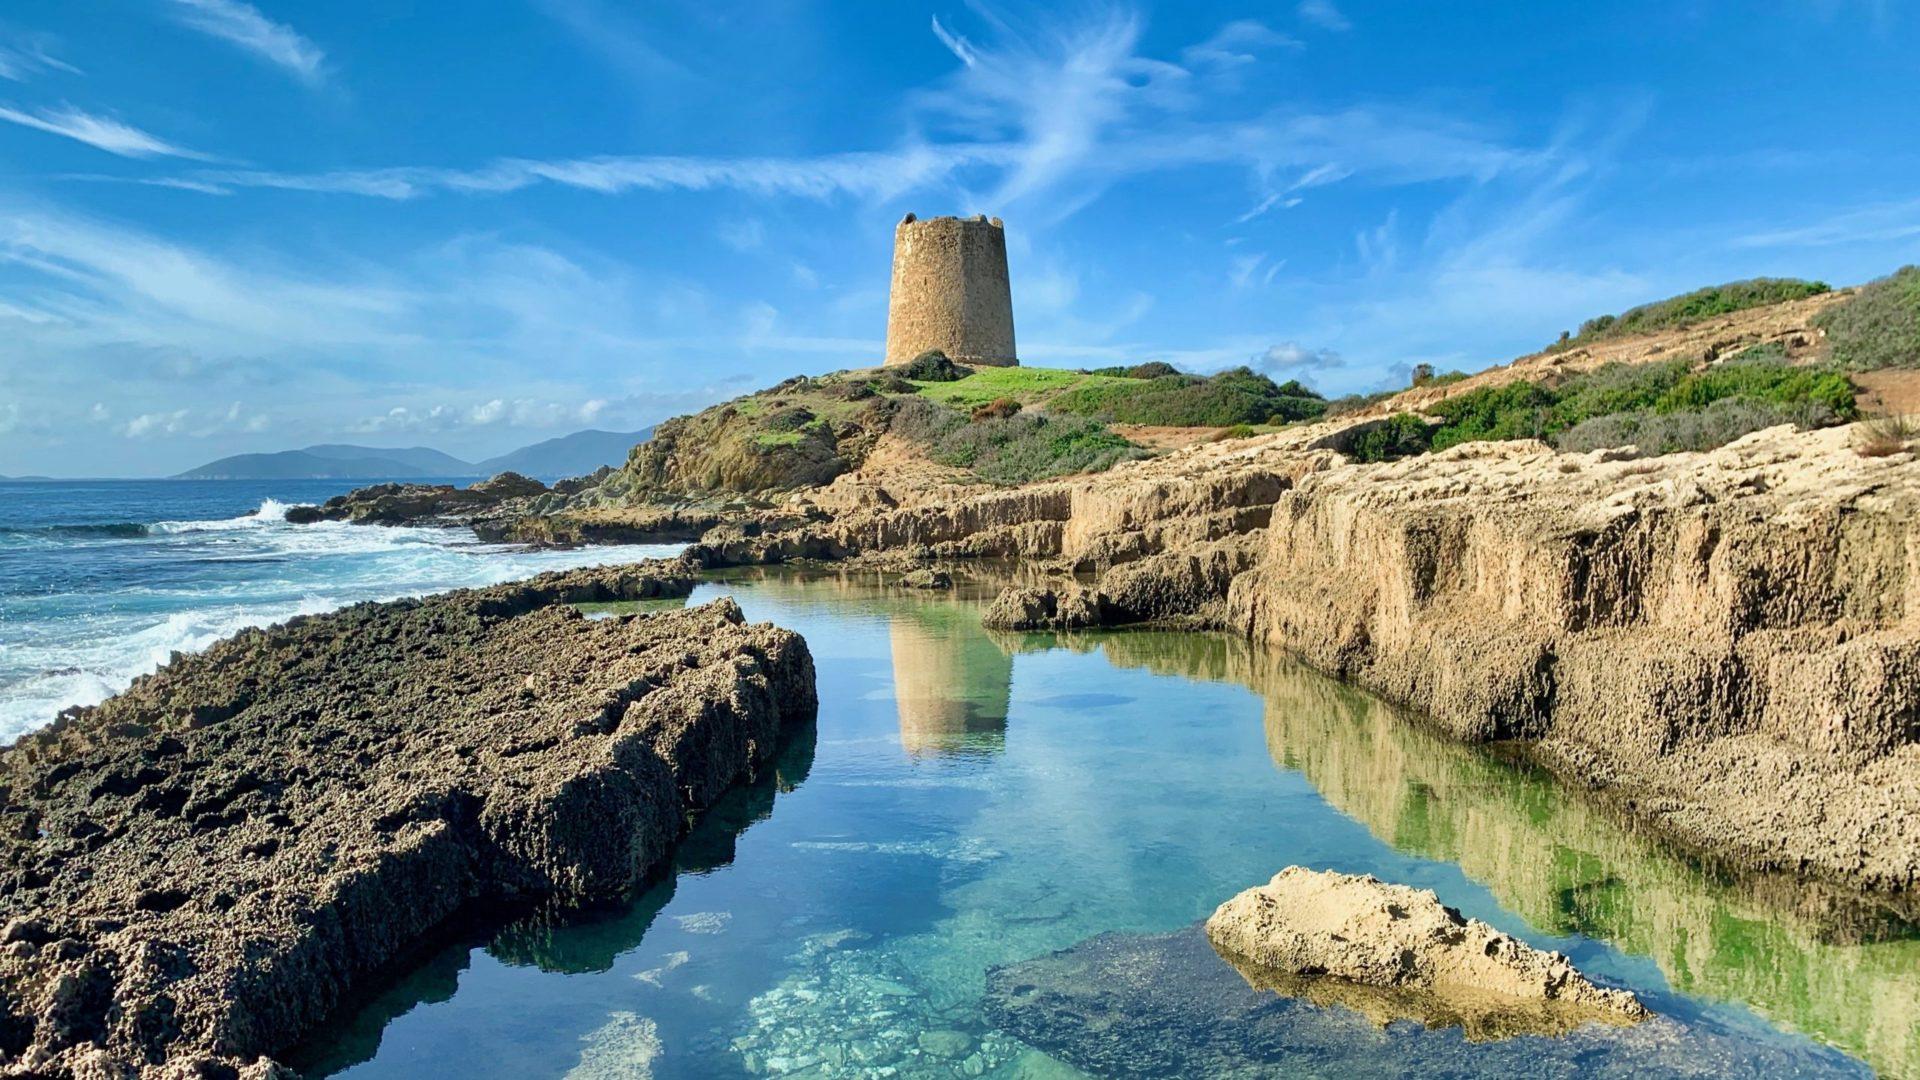 Wassertemperatur Cagliari: Turmruine Torre di Porto Giunco im Naturschutzgebiet Cape Carbonara auf Sardinien